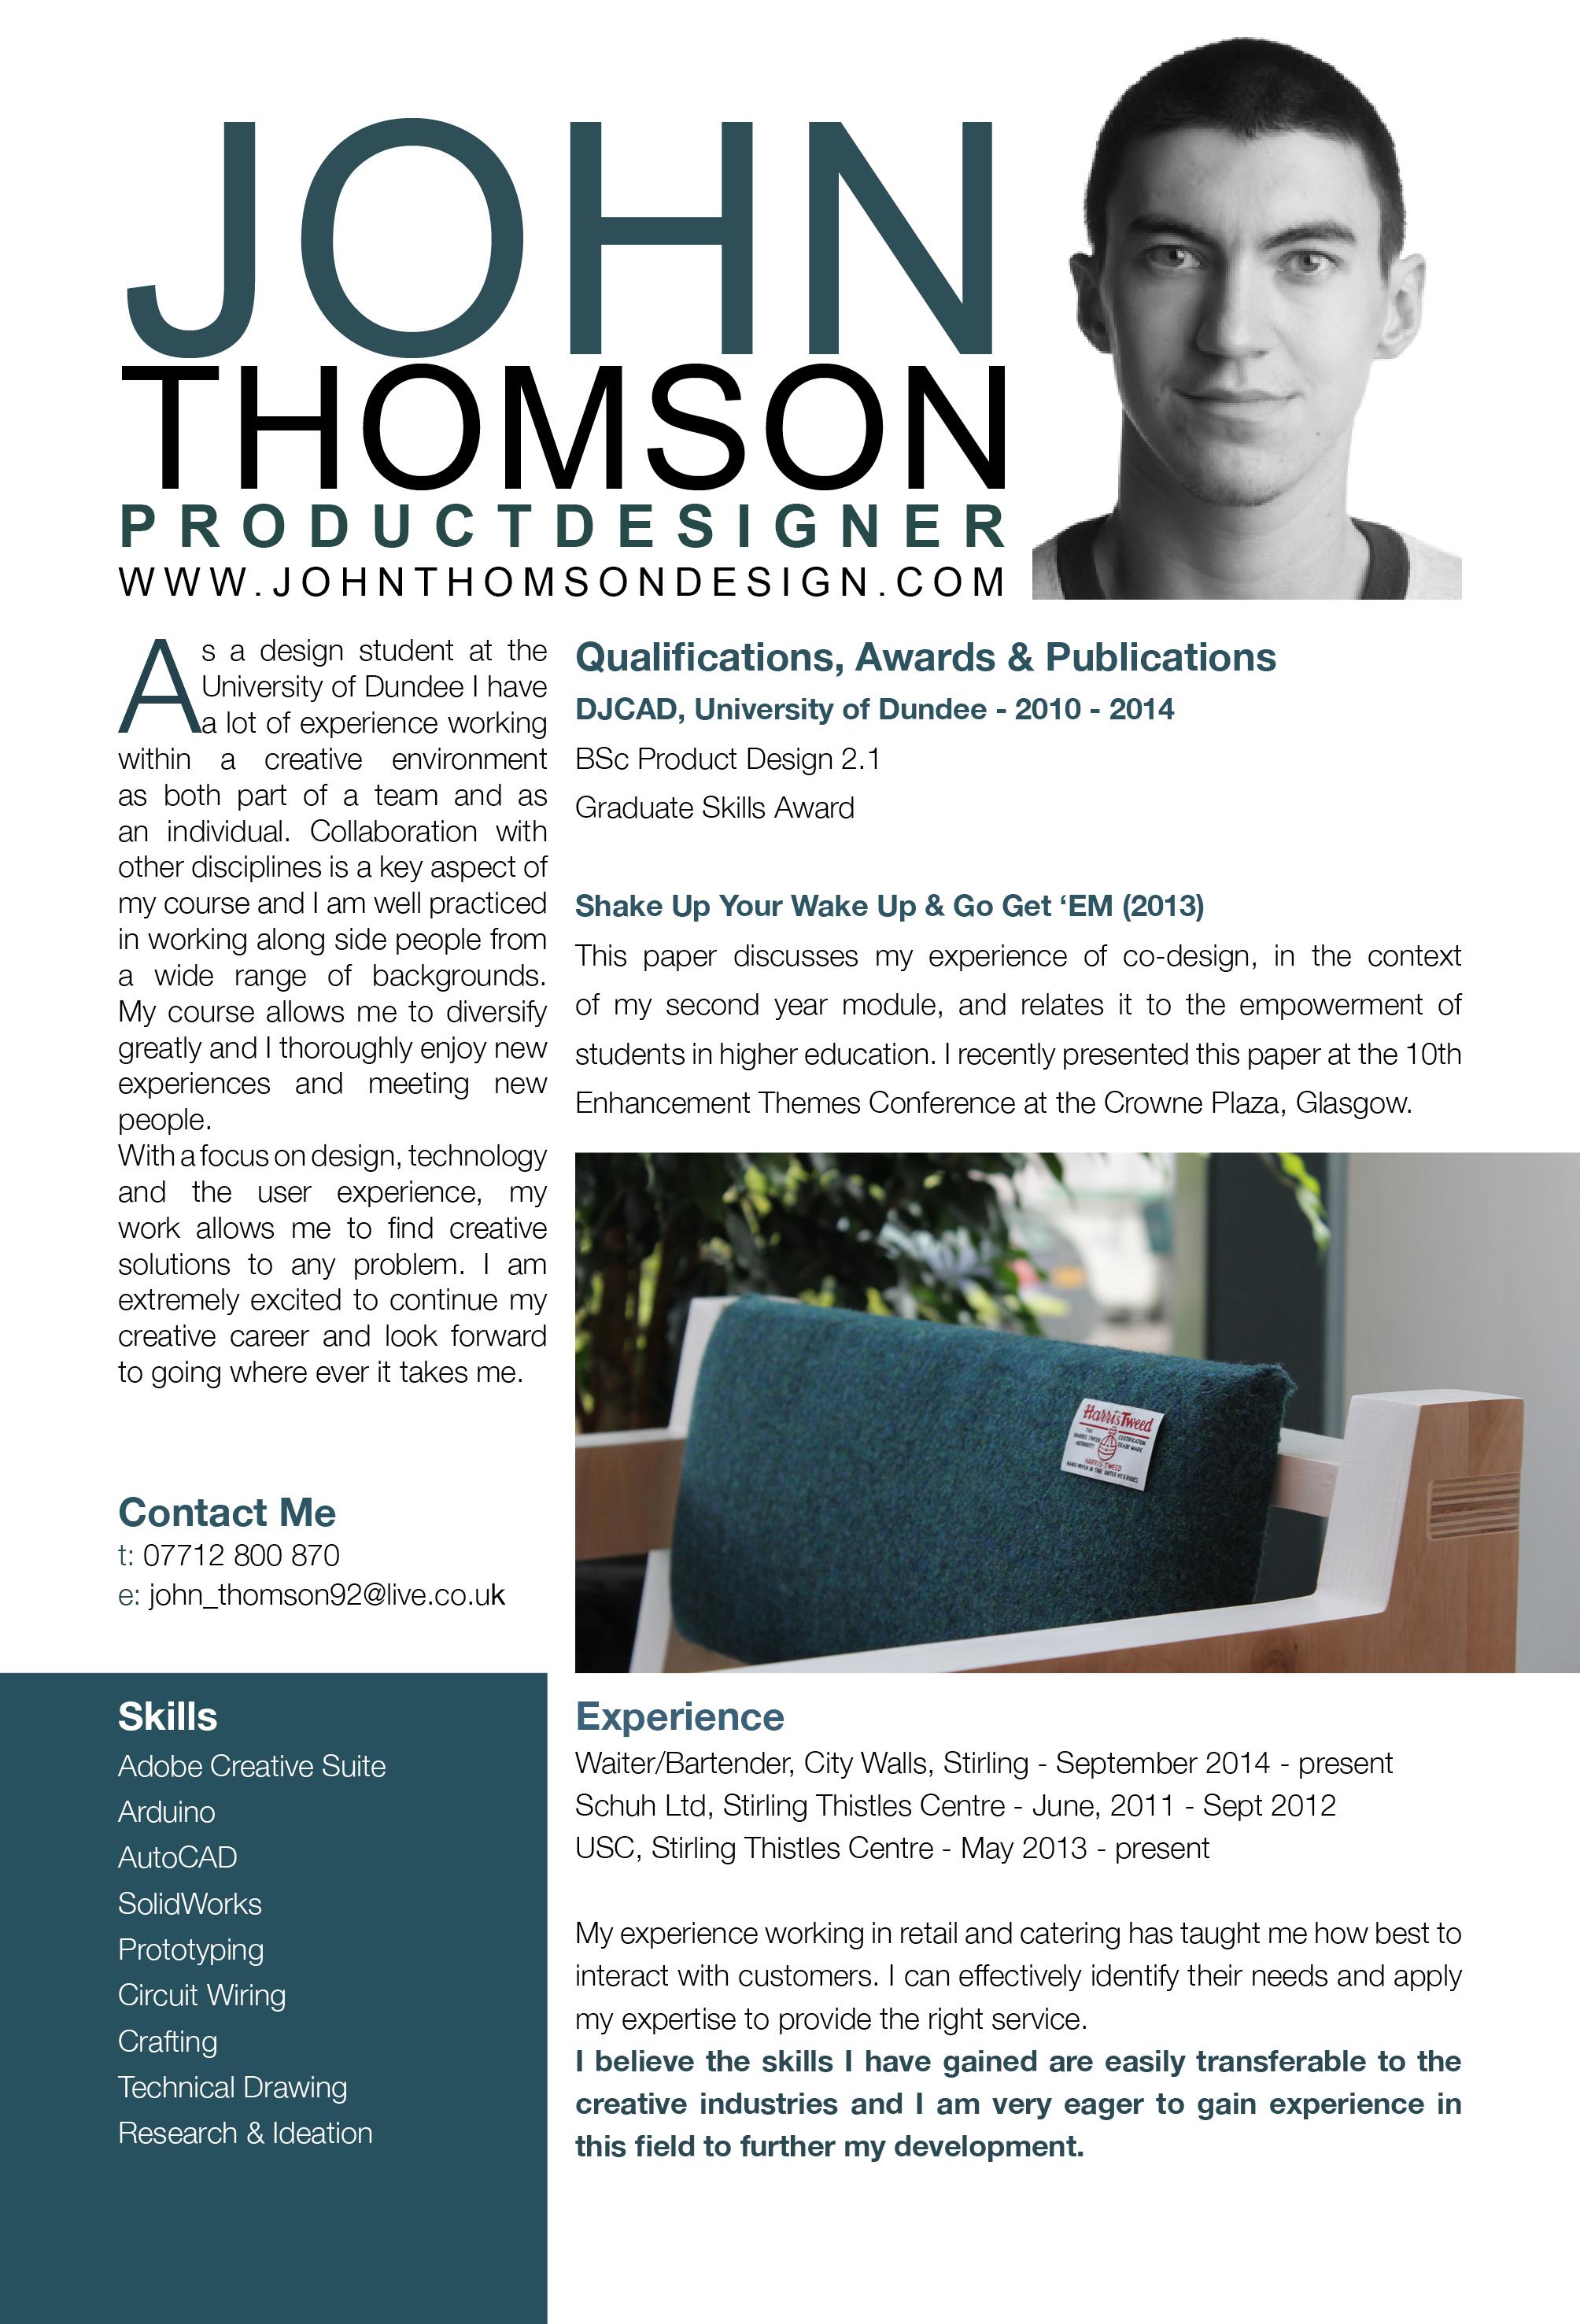 Curriculum Vitae | John Thomson